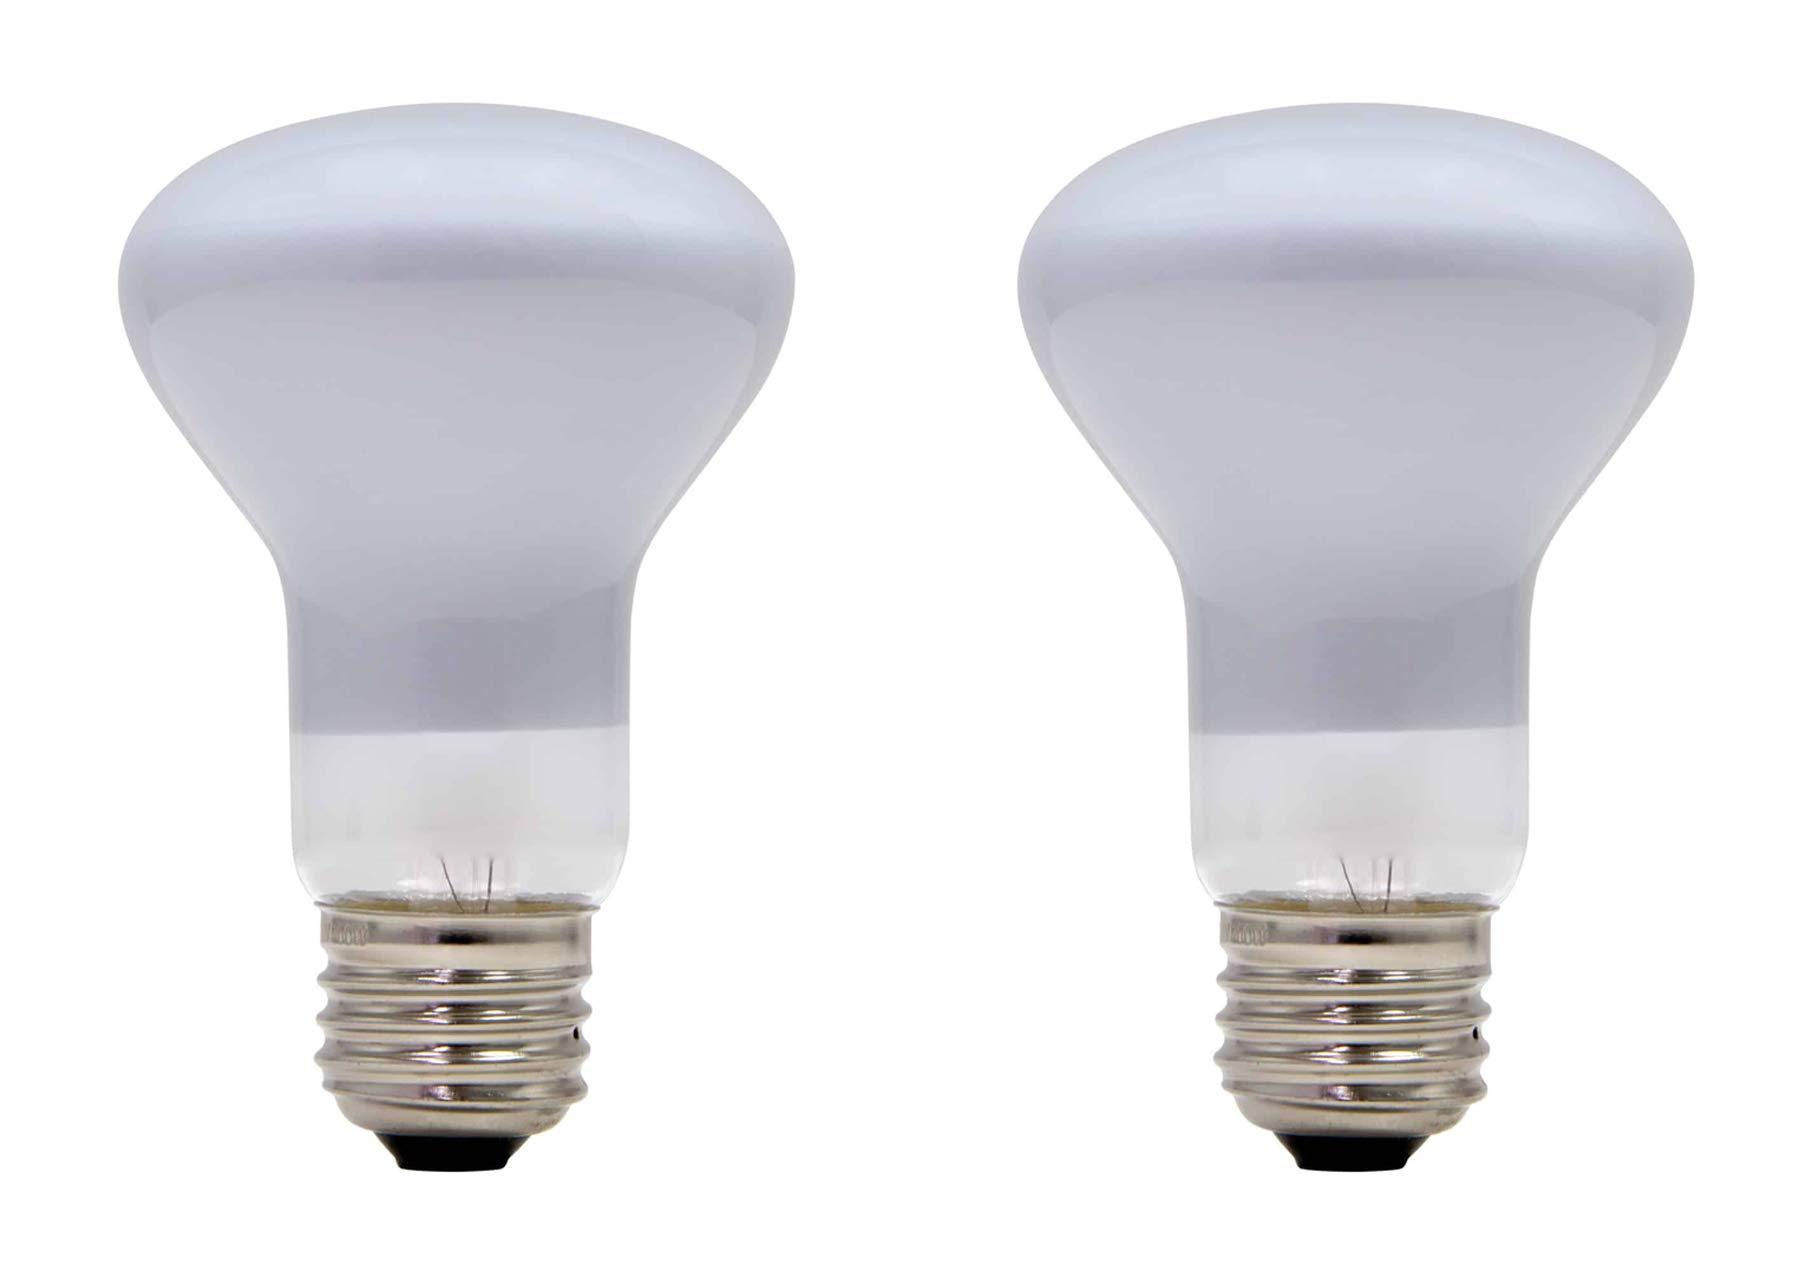 2 Pack Lava Lamp 100 Watt Replacement Bulbs for Lava Brand Grande Motion Lamp